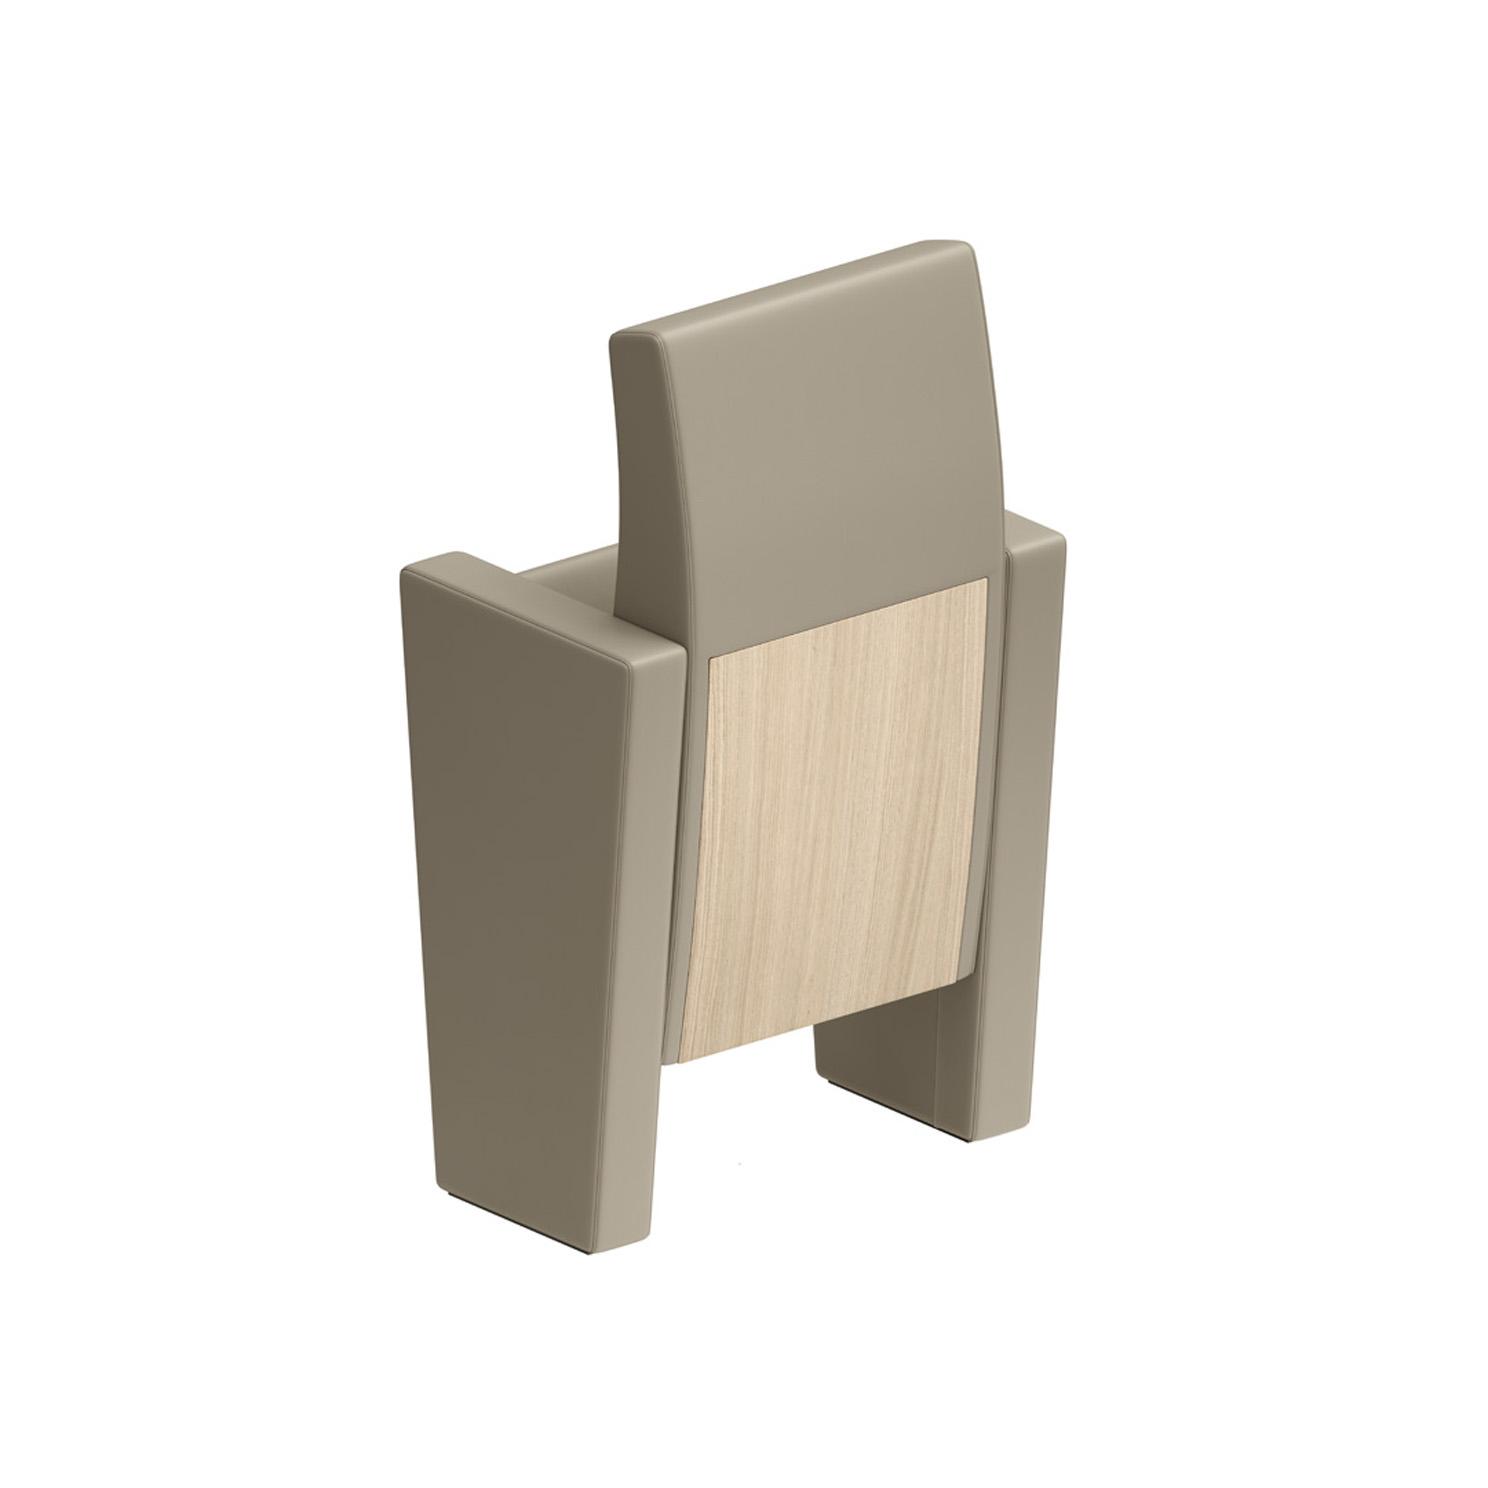 LAMM C900 Chair   Woodwood Group